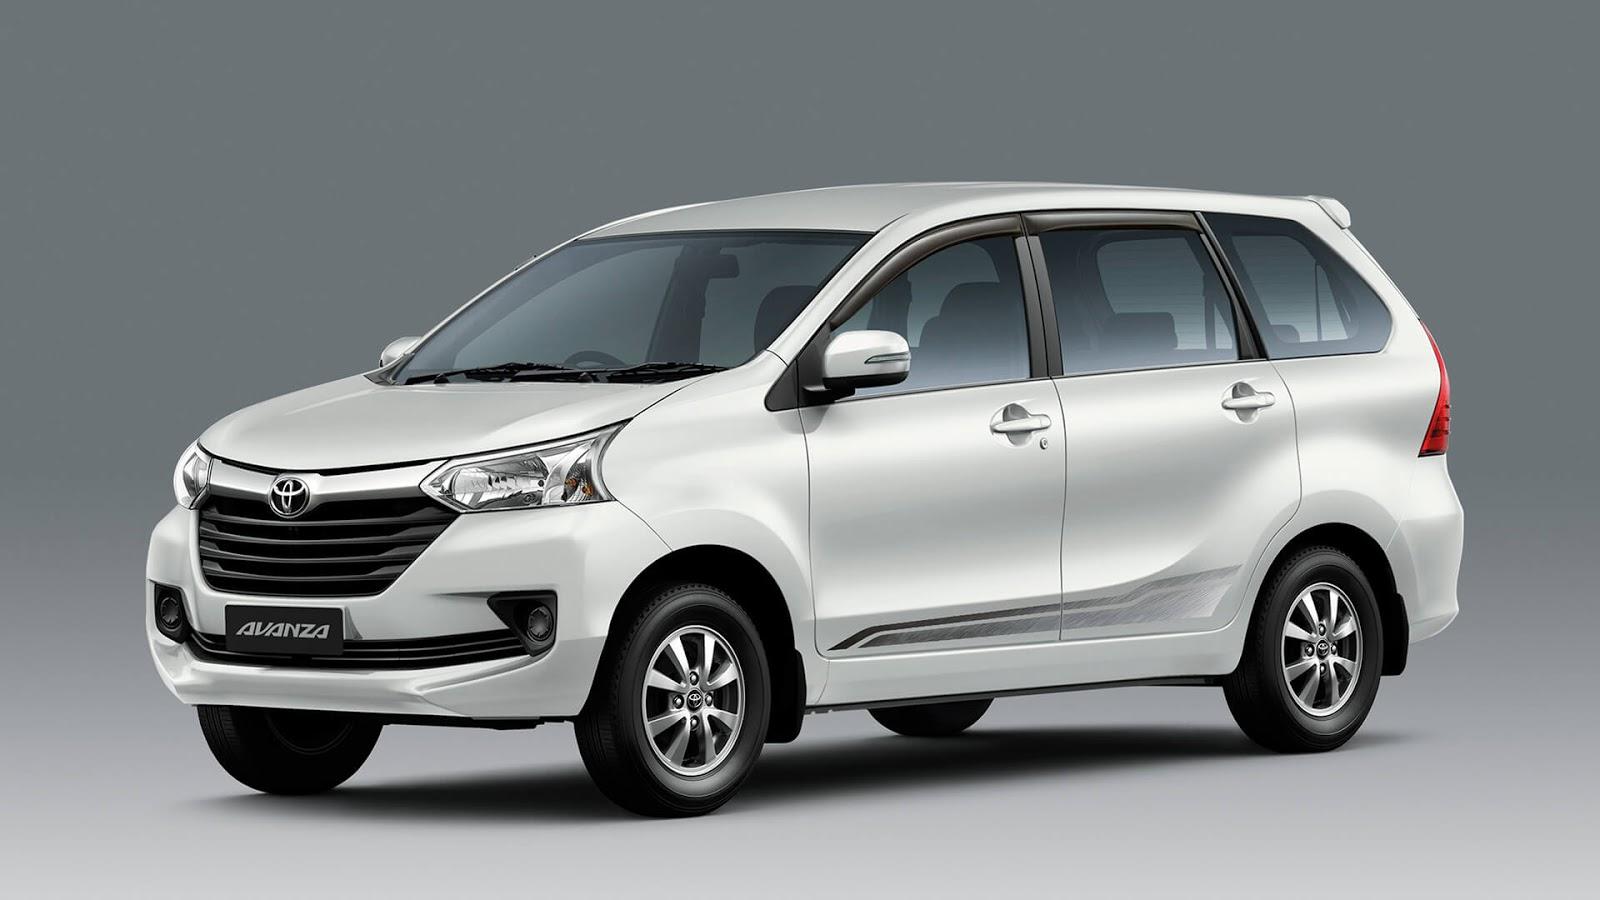 list grand new avanza kijang innova diesel 2017 of toyota types price philippines top